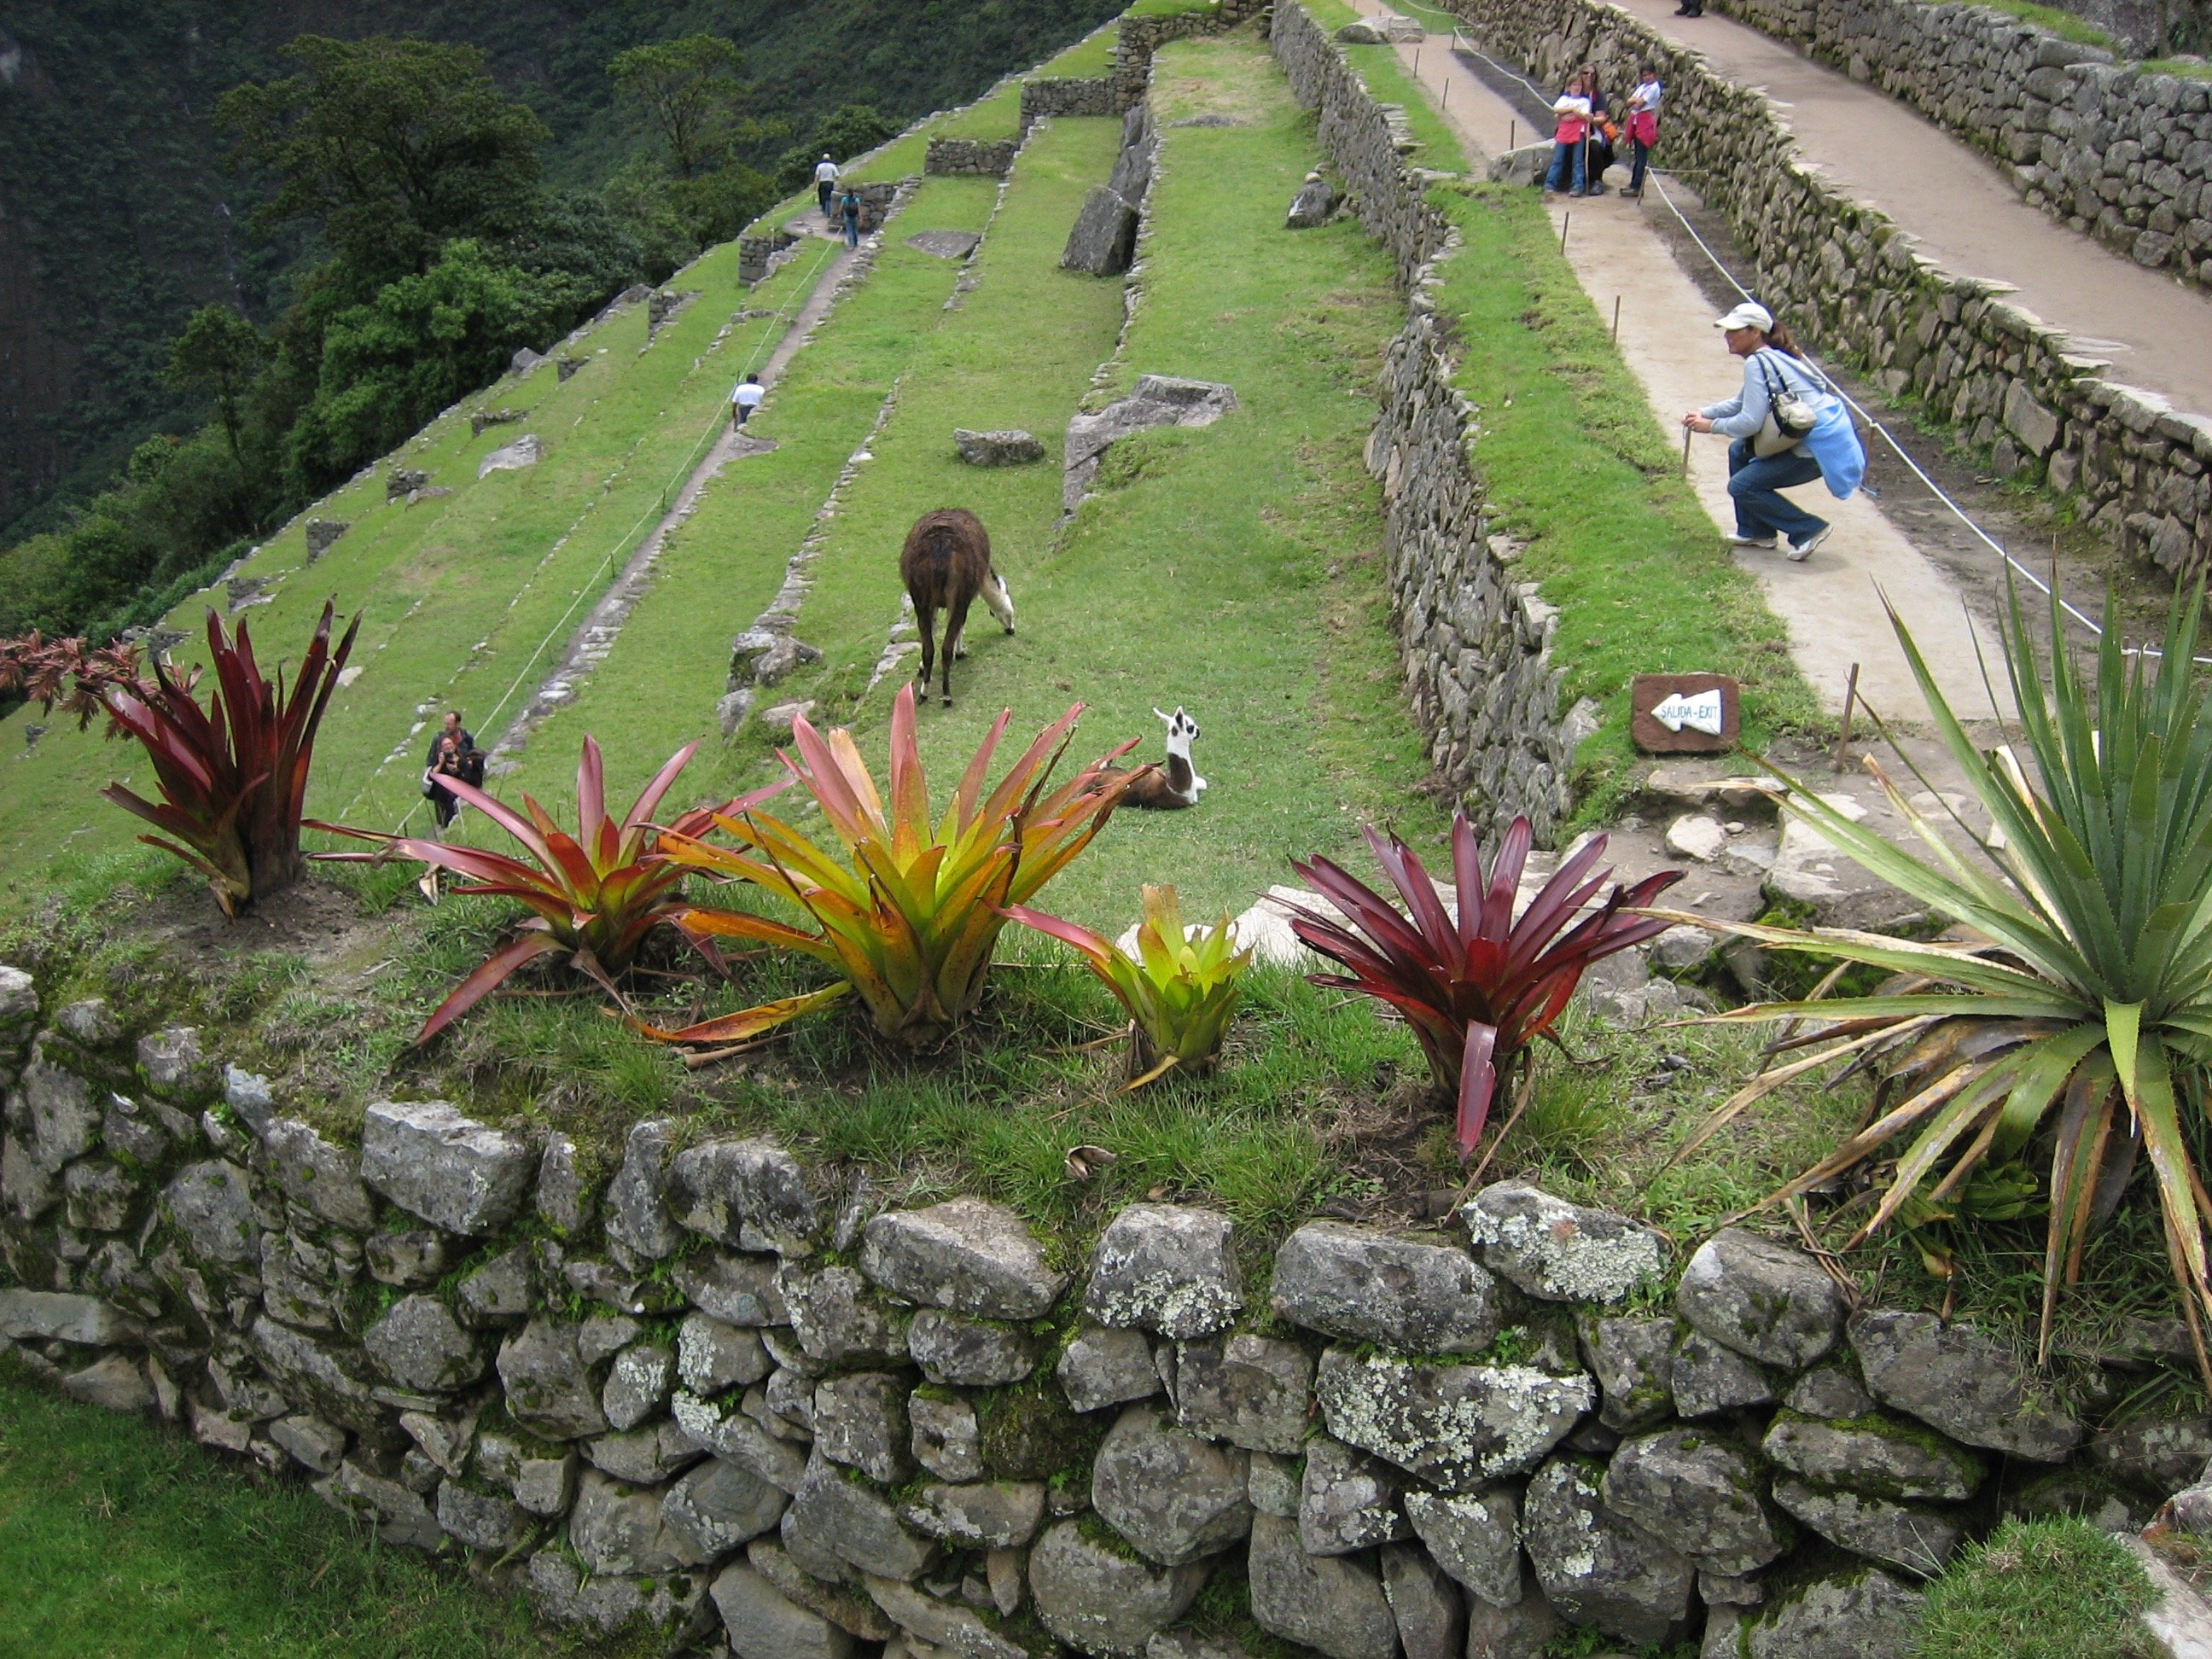 temple, inka temple, inca temple, templo, machu picchu, machupicchu, machu picchu temple, aguas calientes, cusco, peru, tour, trek, trip, killa expeditions, adventure, trek to machu picchu, machu picchu trek, machu picchu tour, train tour, terraces